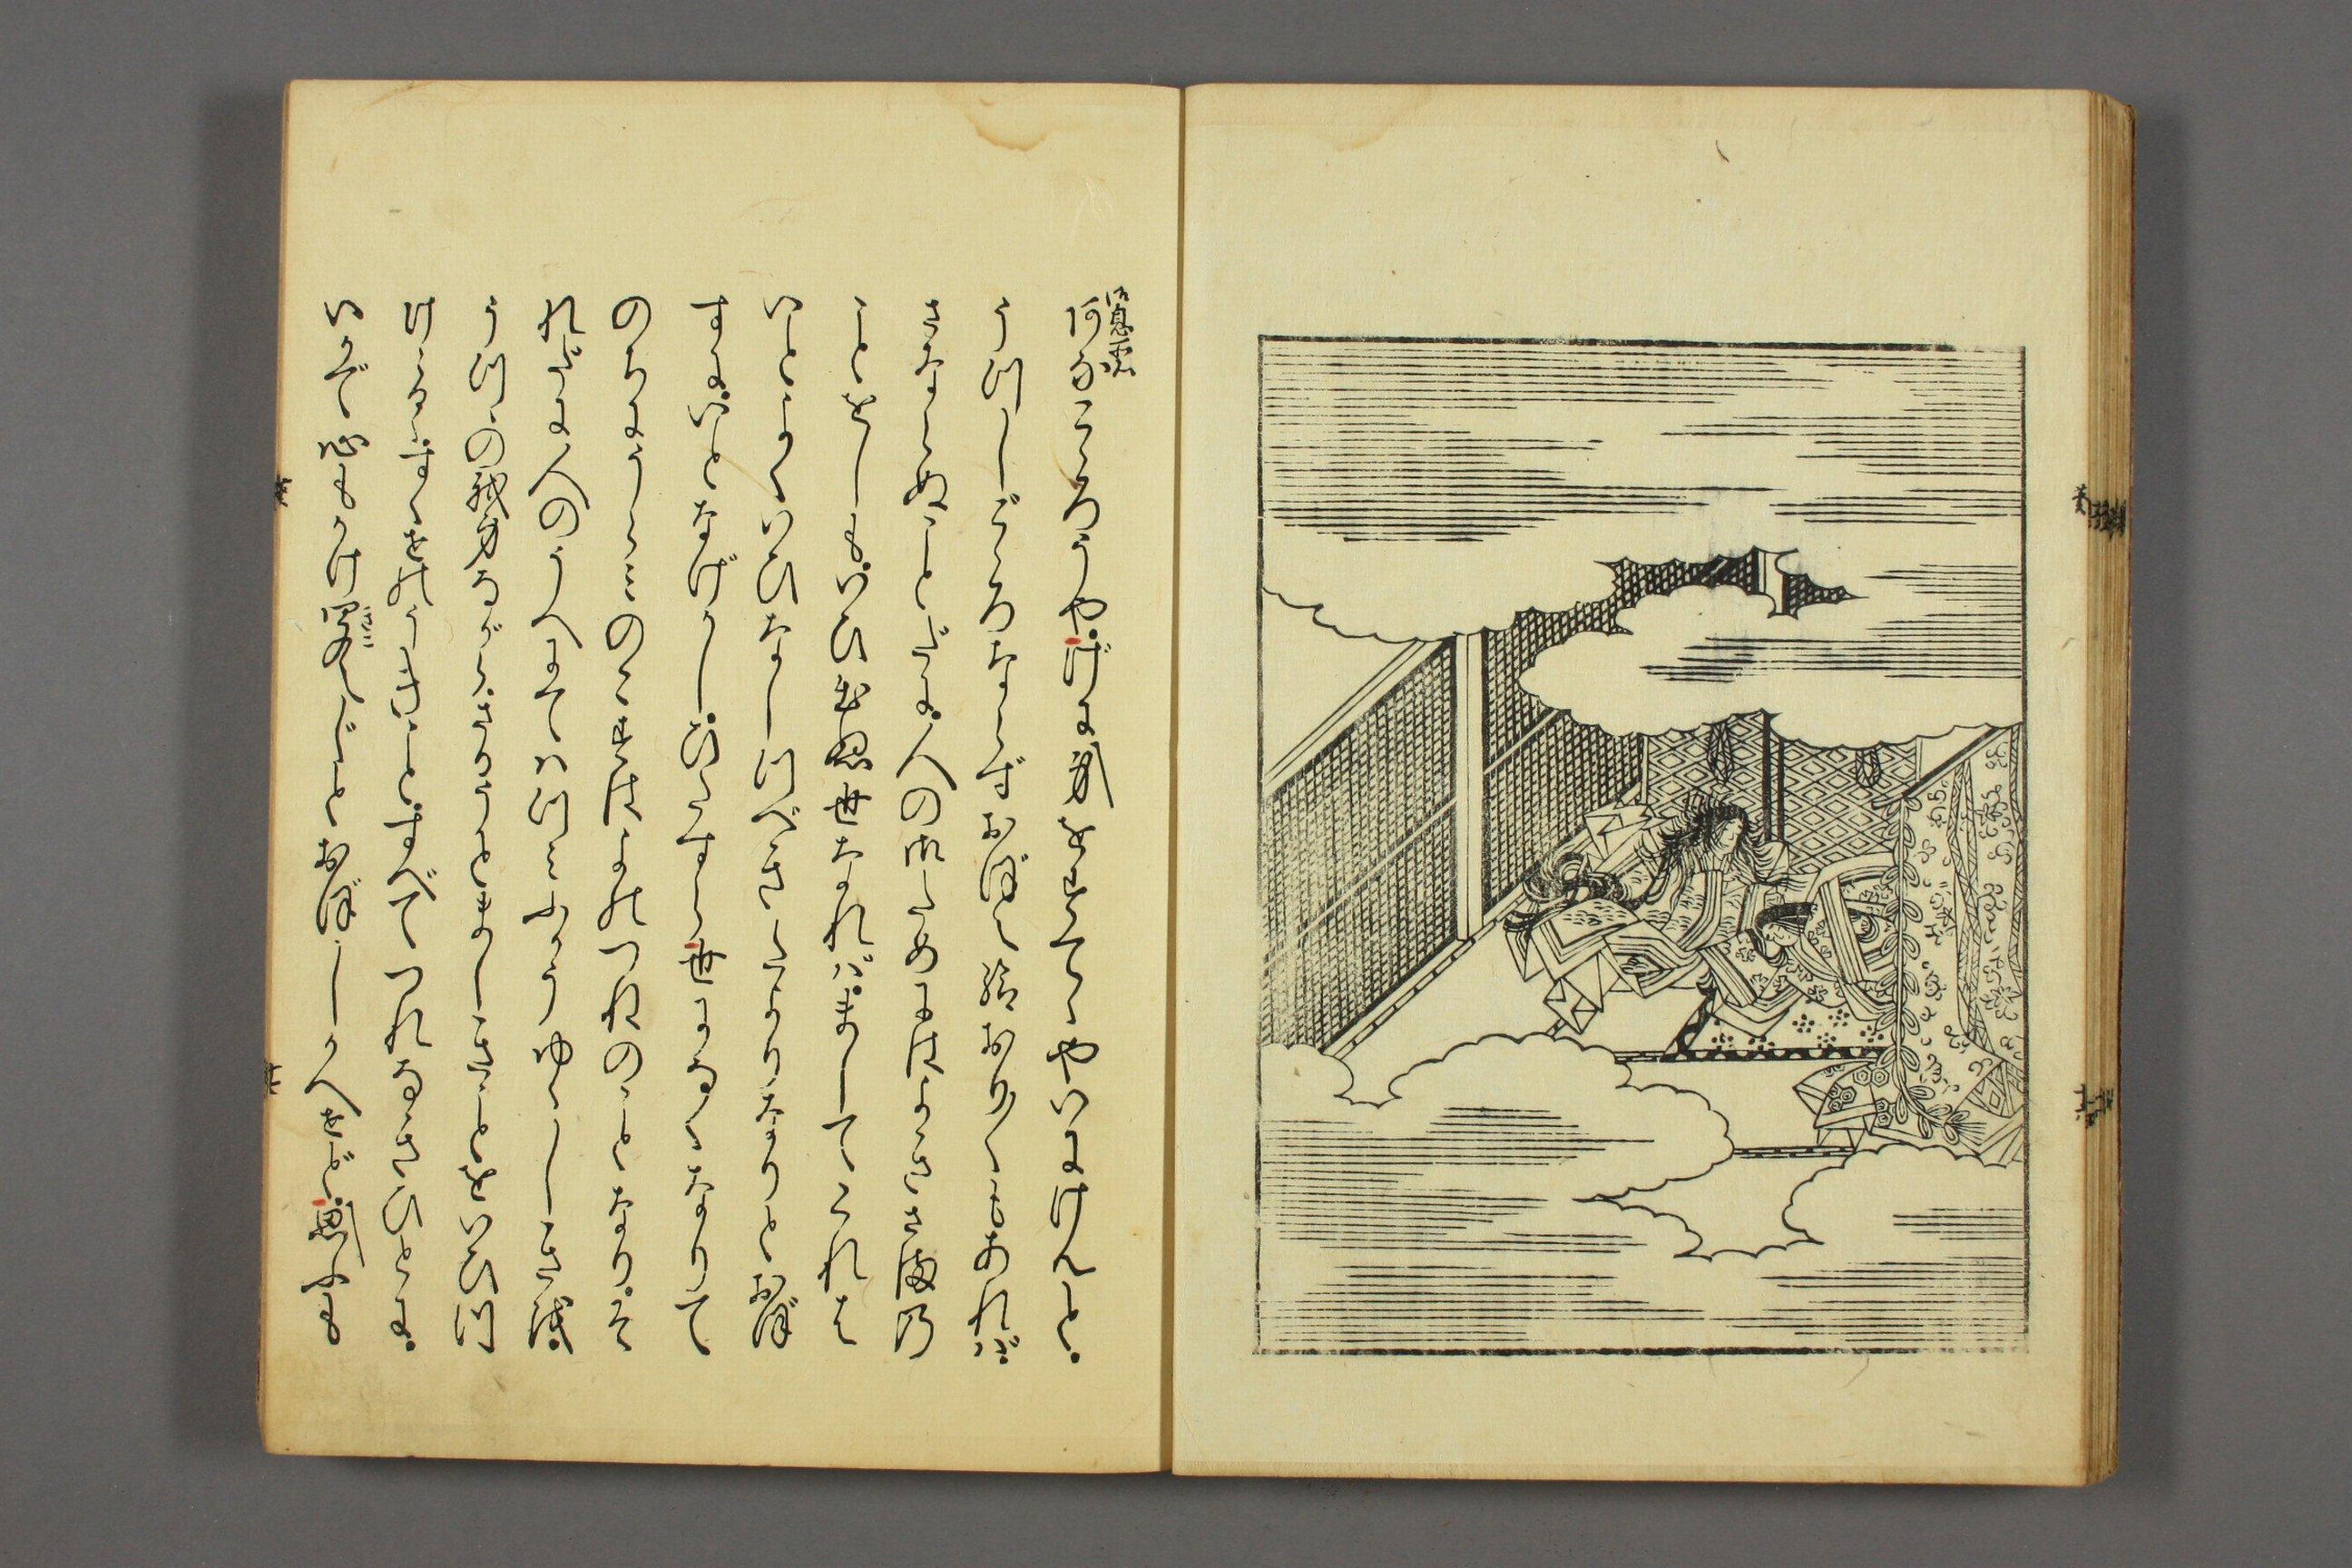 http://archive.wul.waseda.ac.jp/kosho/bunko30/bunko30_a0007/bunko30_a0007_0009/bunko30_a0007_0009_p0018.jpg